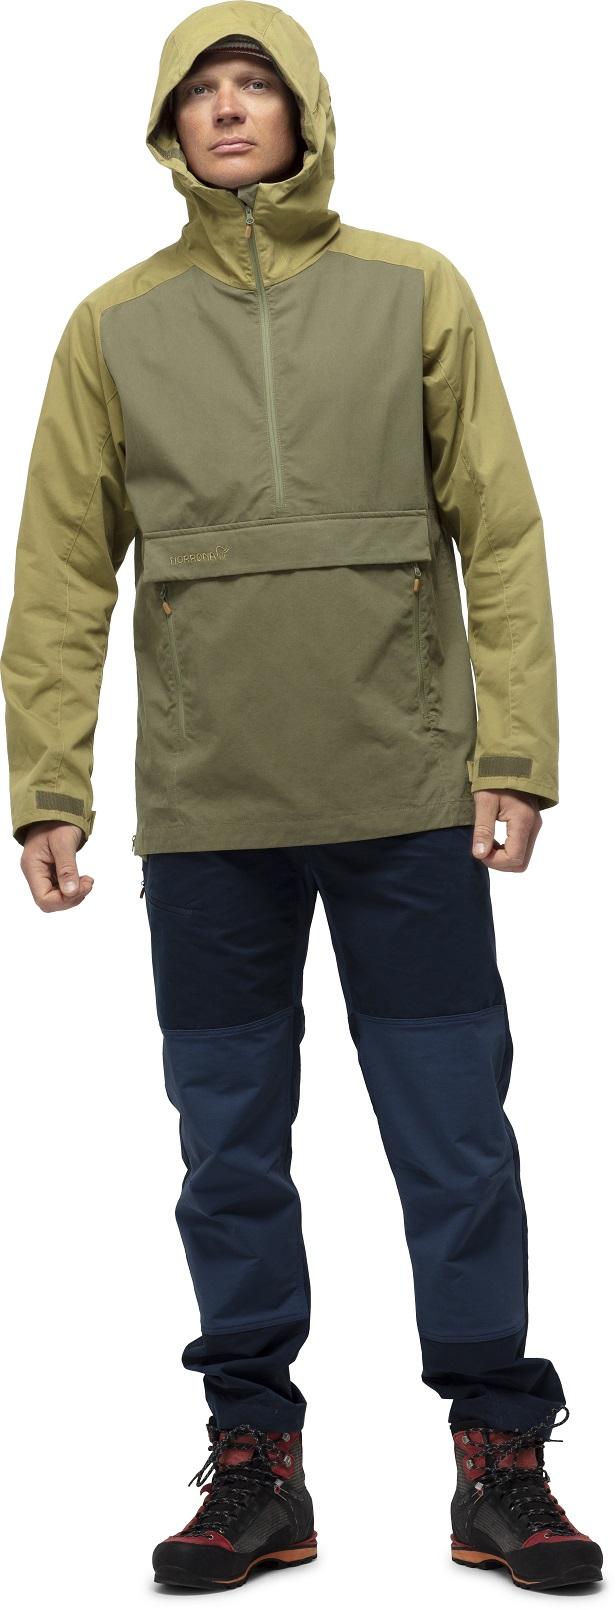 "Norrona ""Svalbard Cotton Anorak"" - olive drab"